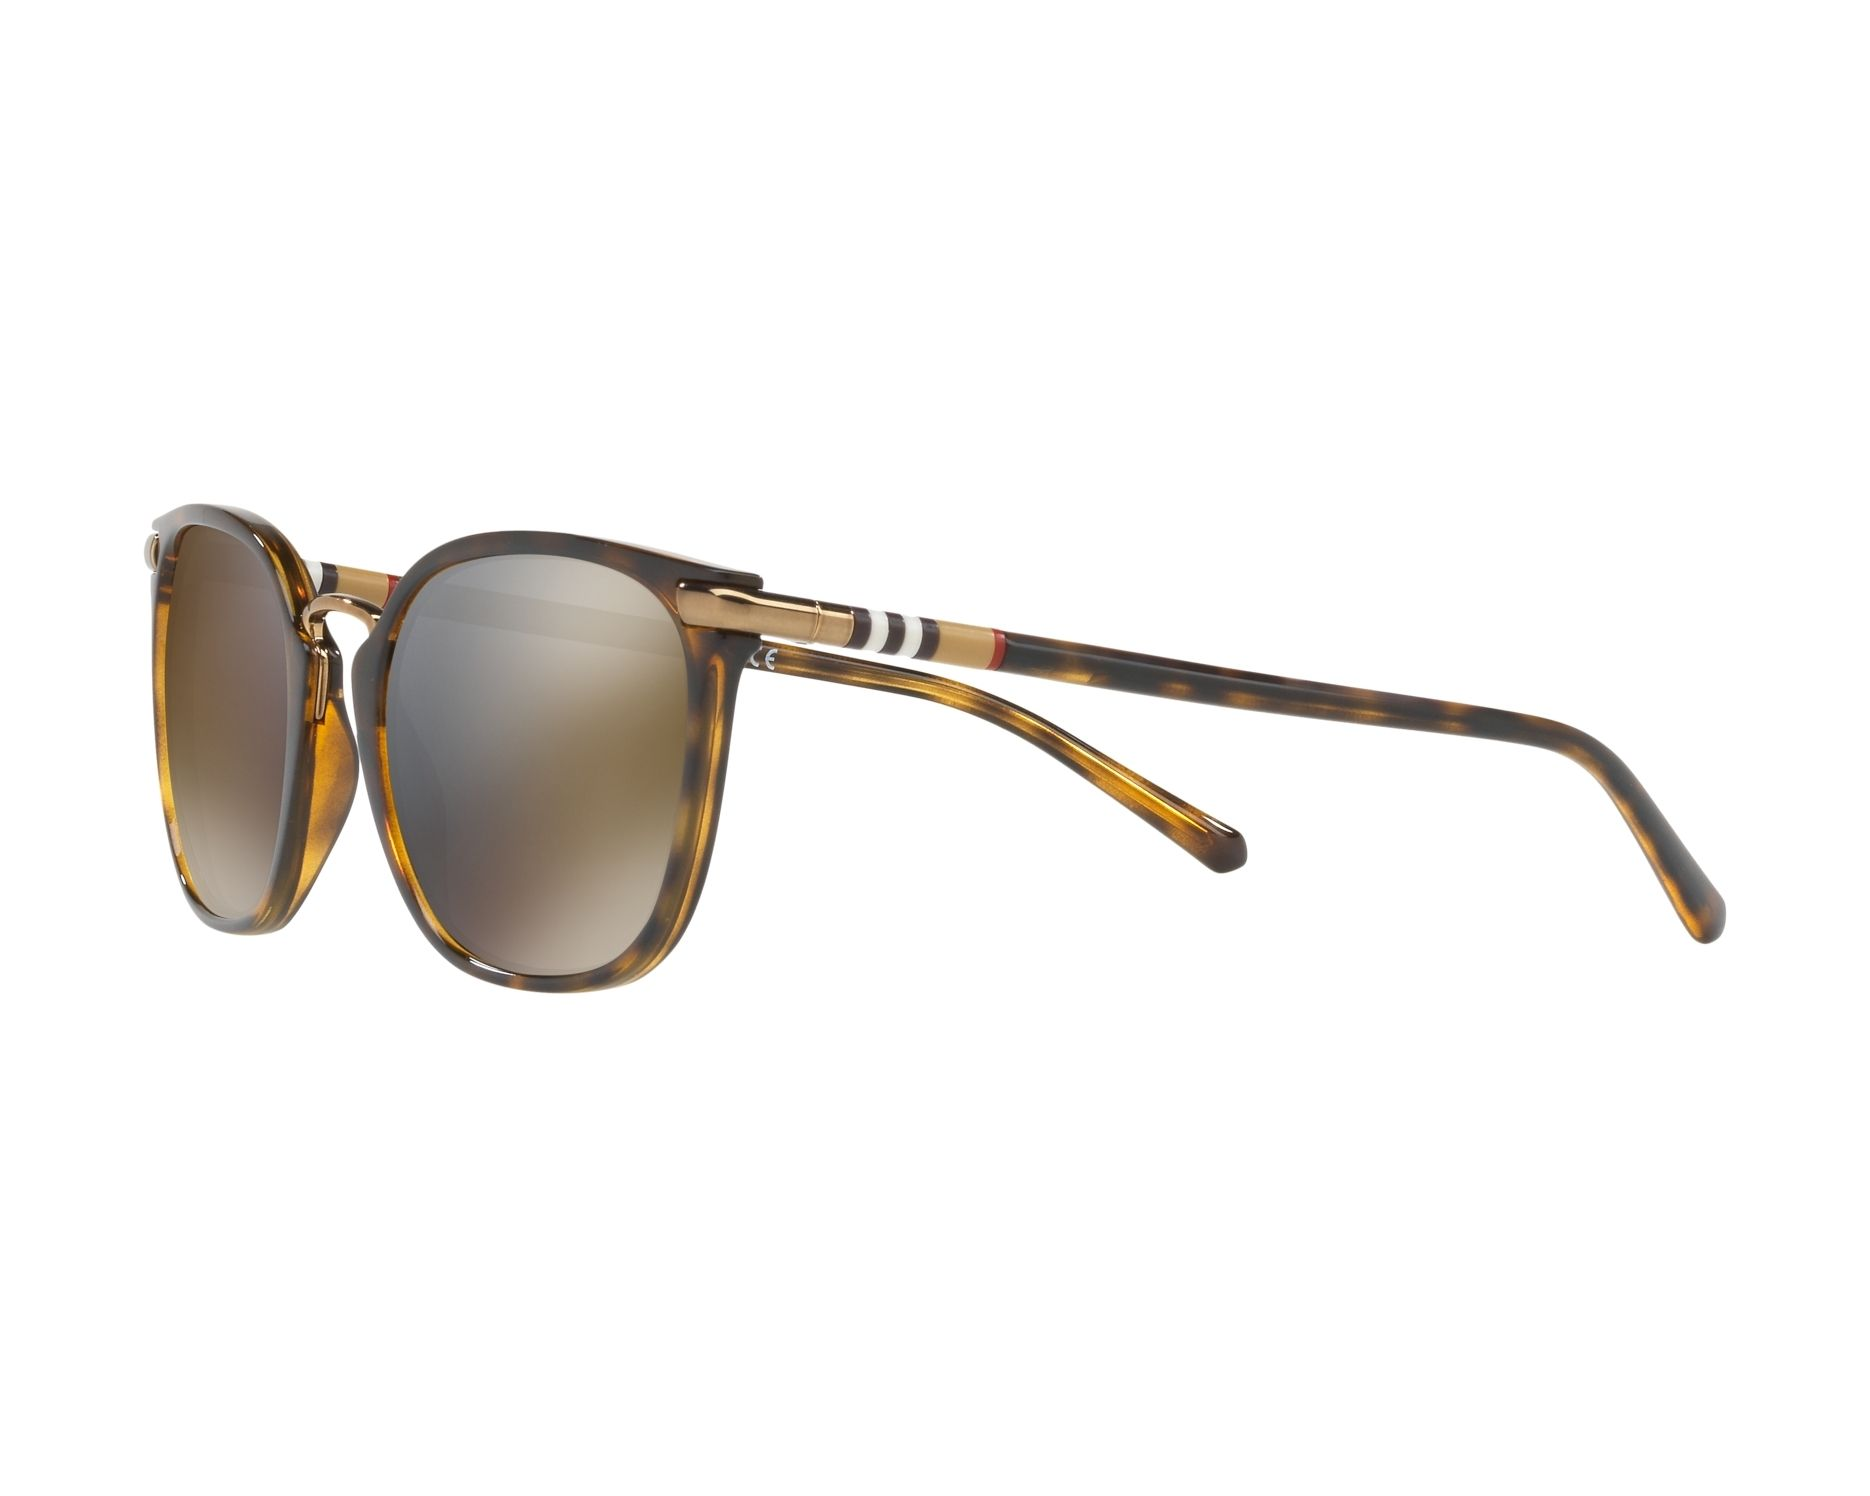 5a0b332dc0 Sunglasses Burberry BE-4262 30024T 53-21 Havana 360 degree view 3